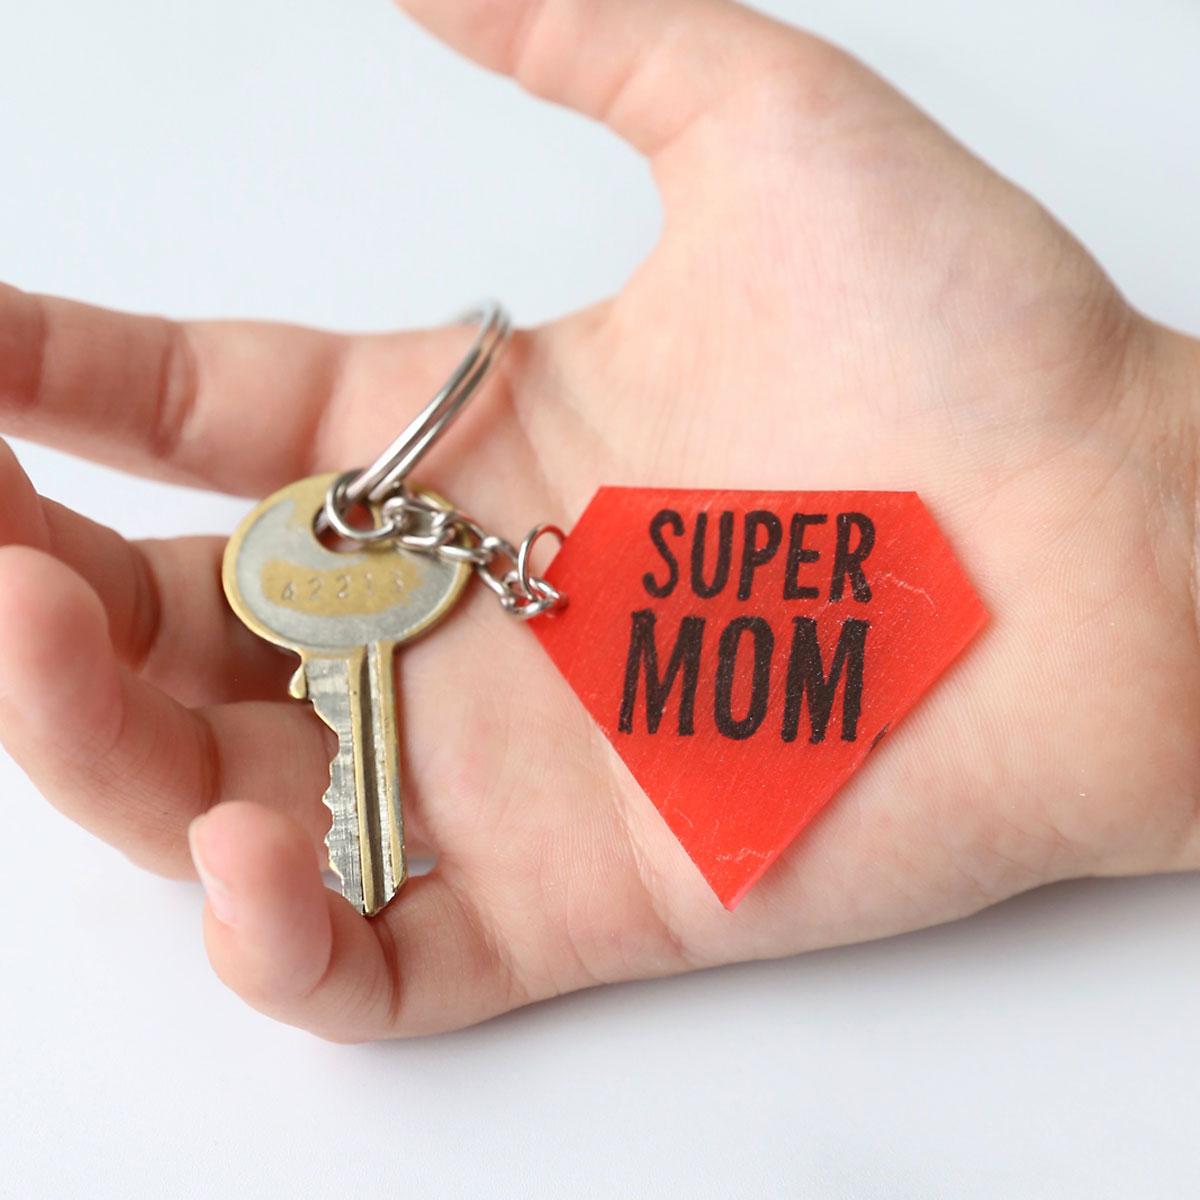 Shrinking Dink Key Chains for {Super} Mom